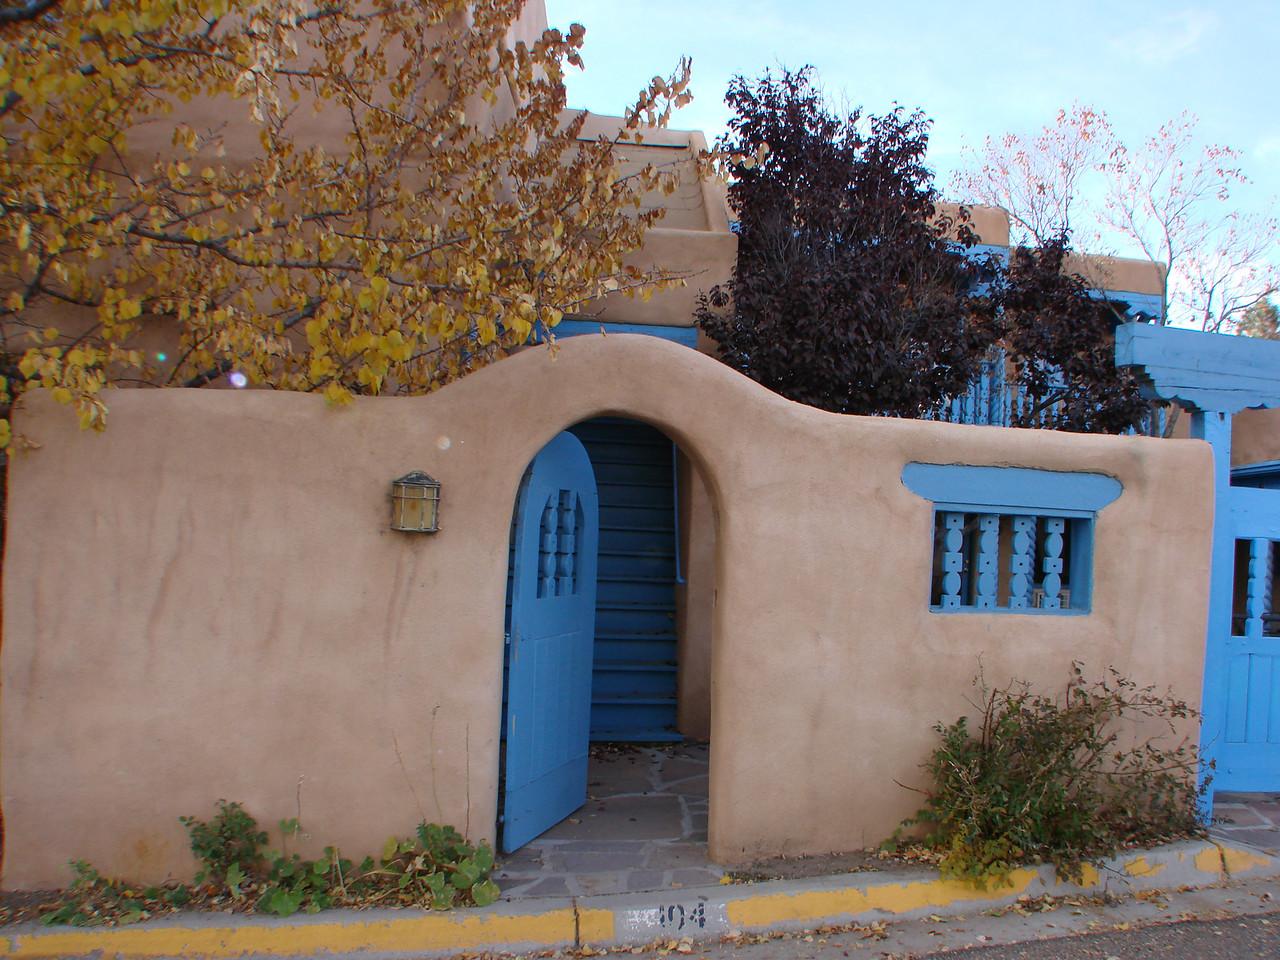 Casa Benavides Bed & Breakfast, Taos, New Mexico  http://www.taos-casabenavides.com/